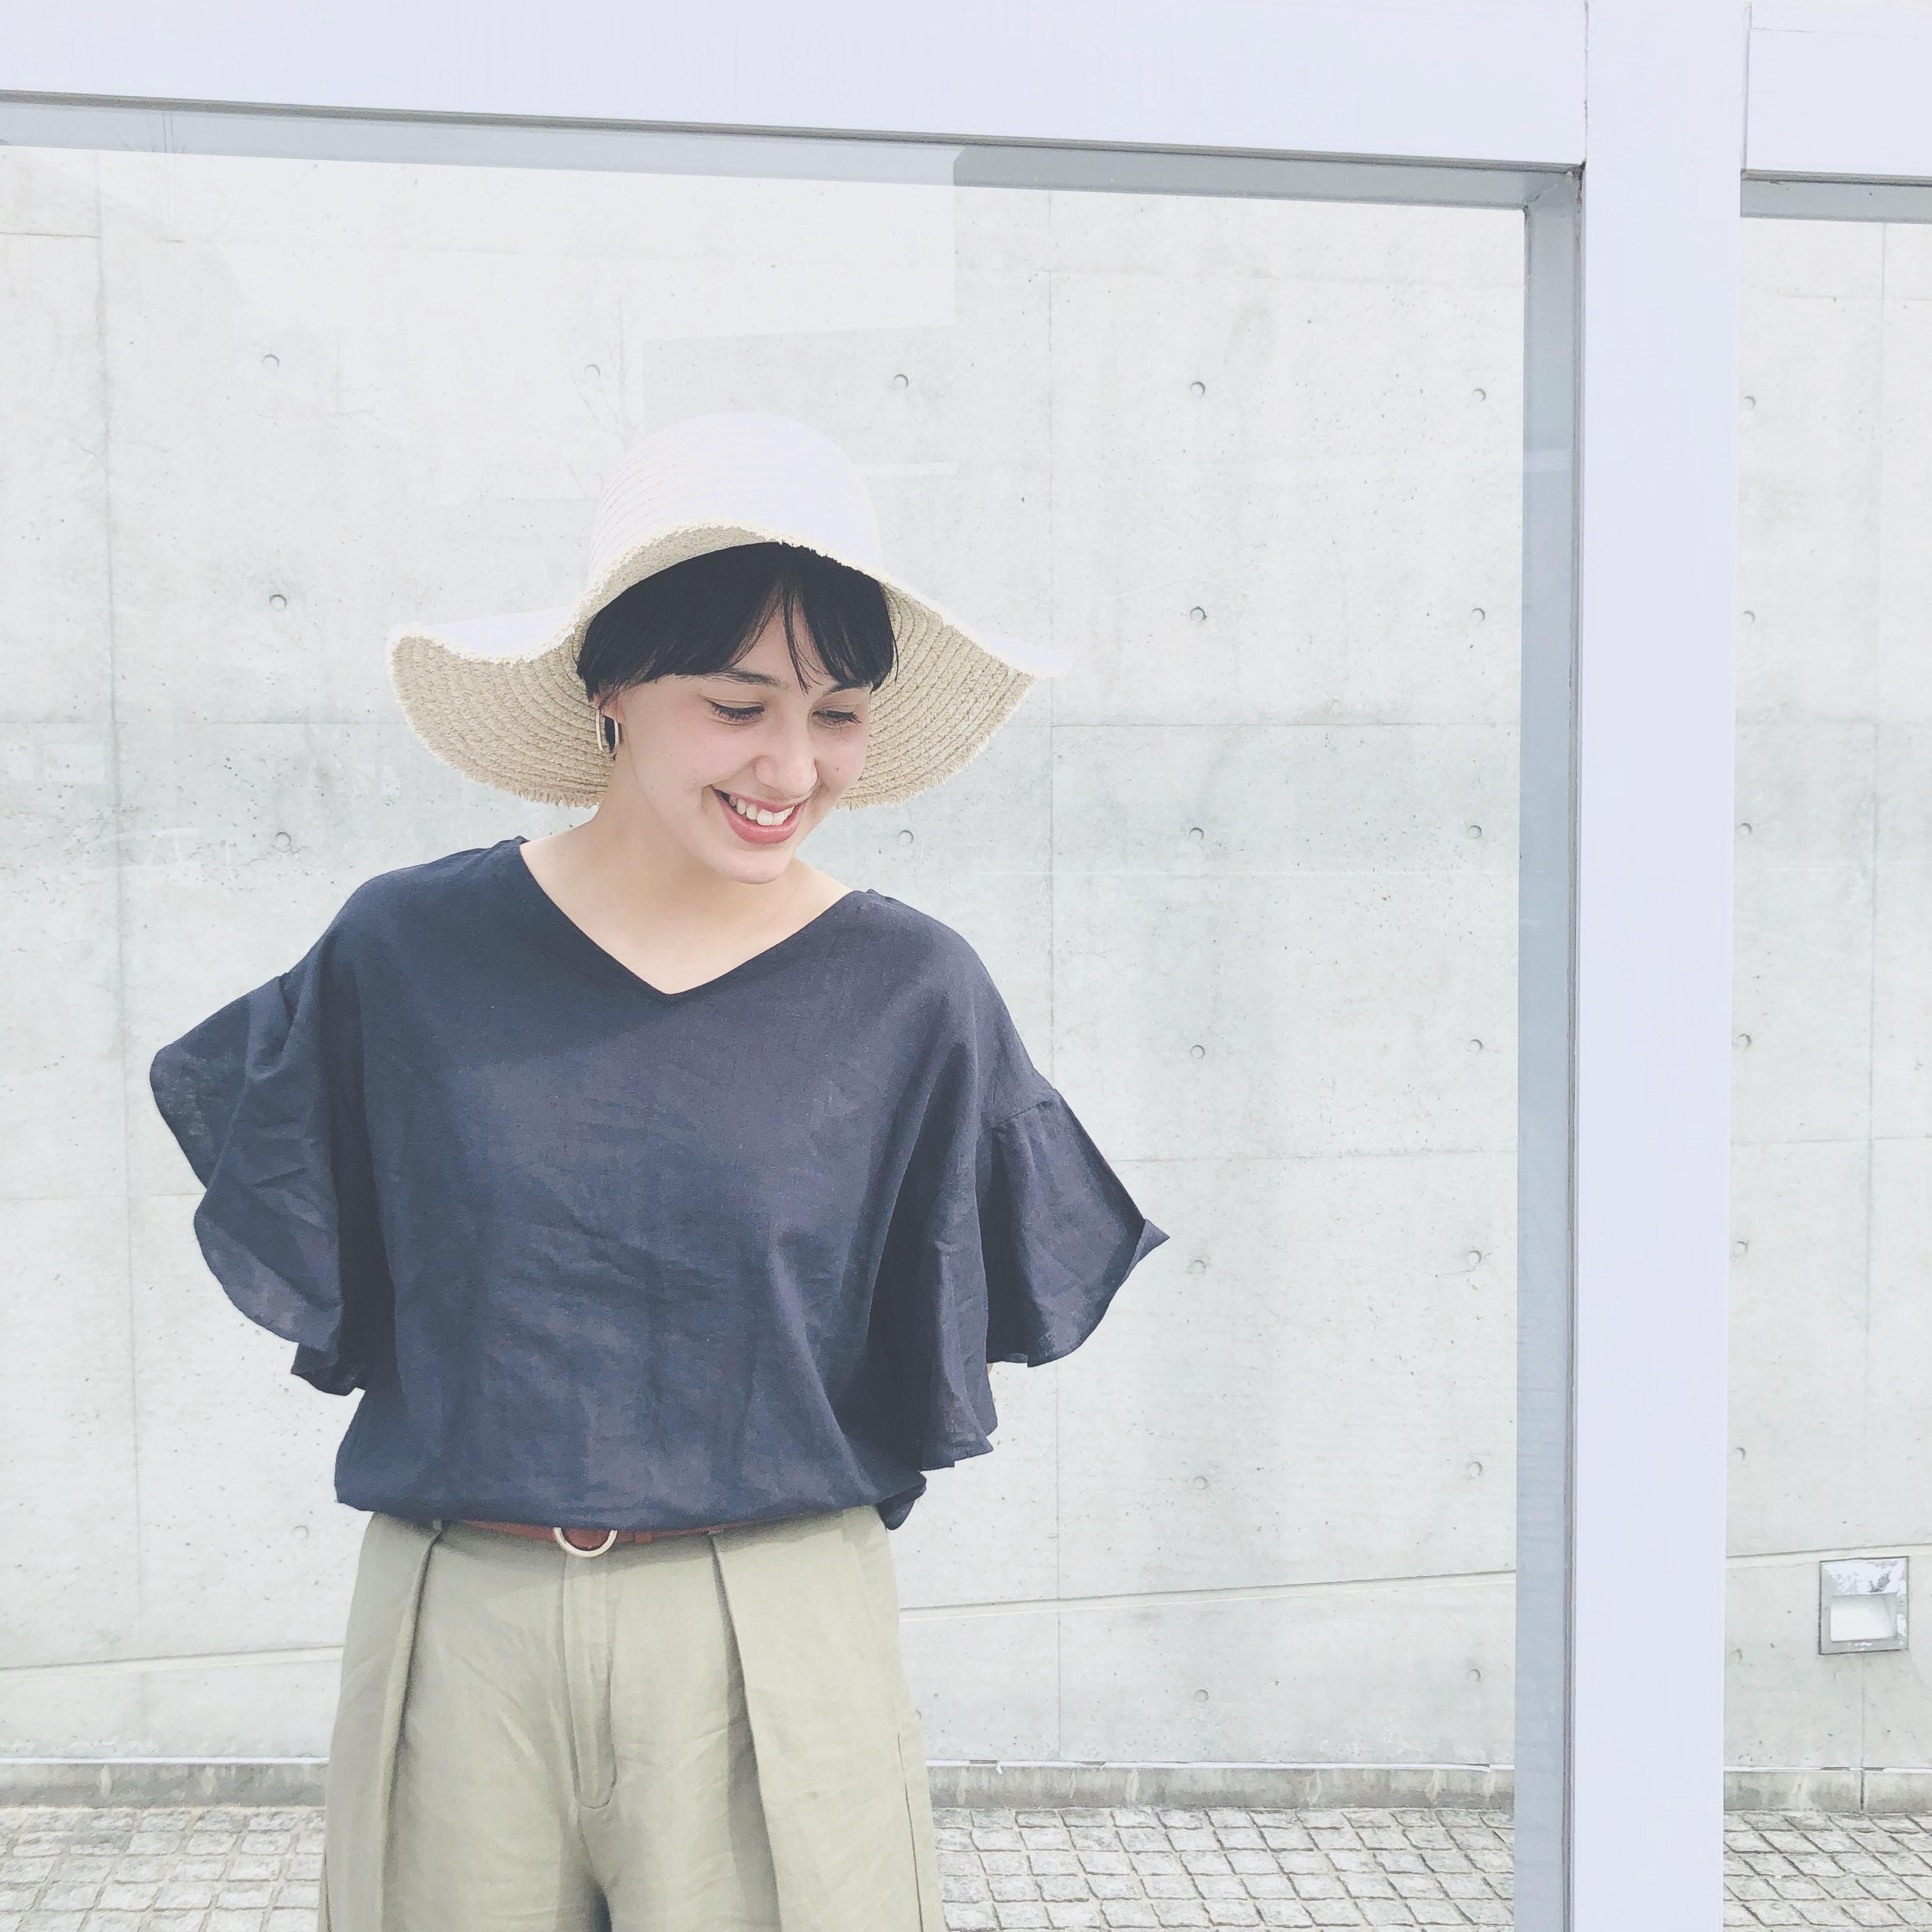 【 Today`s Stole 】つば広ハット、暑い日差しを防げてオシャレに着こなせる♪